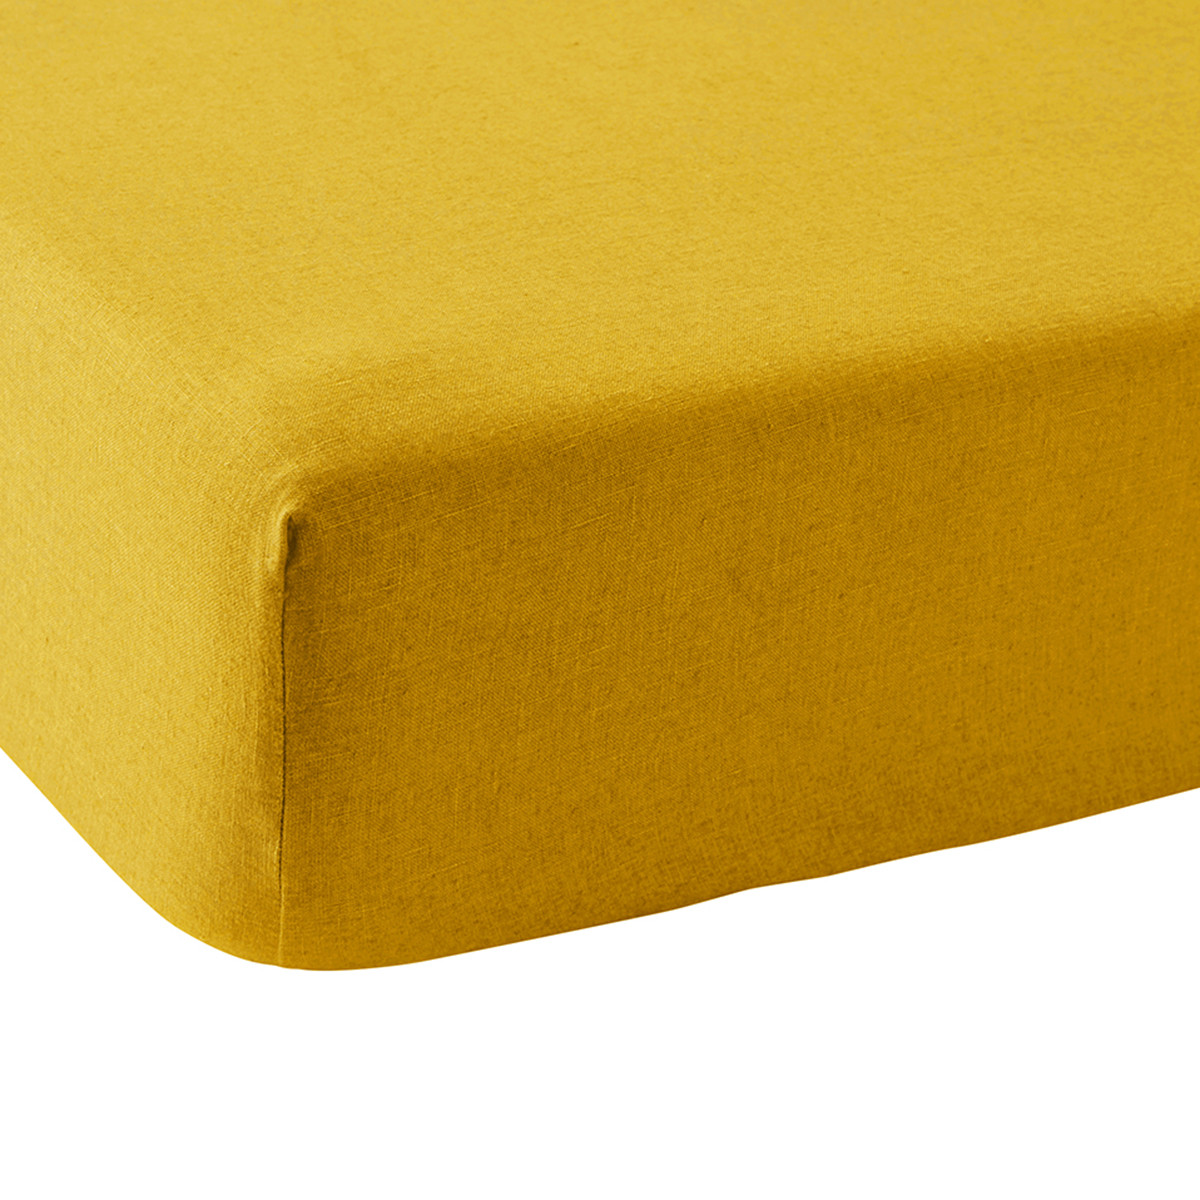 Drap housse lin 160x200 cm miel